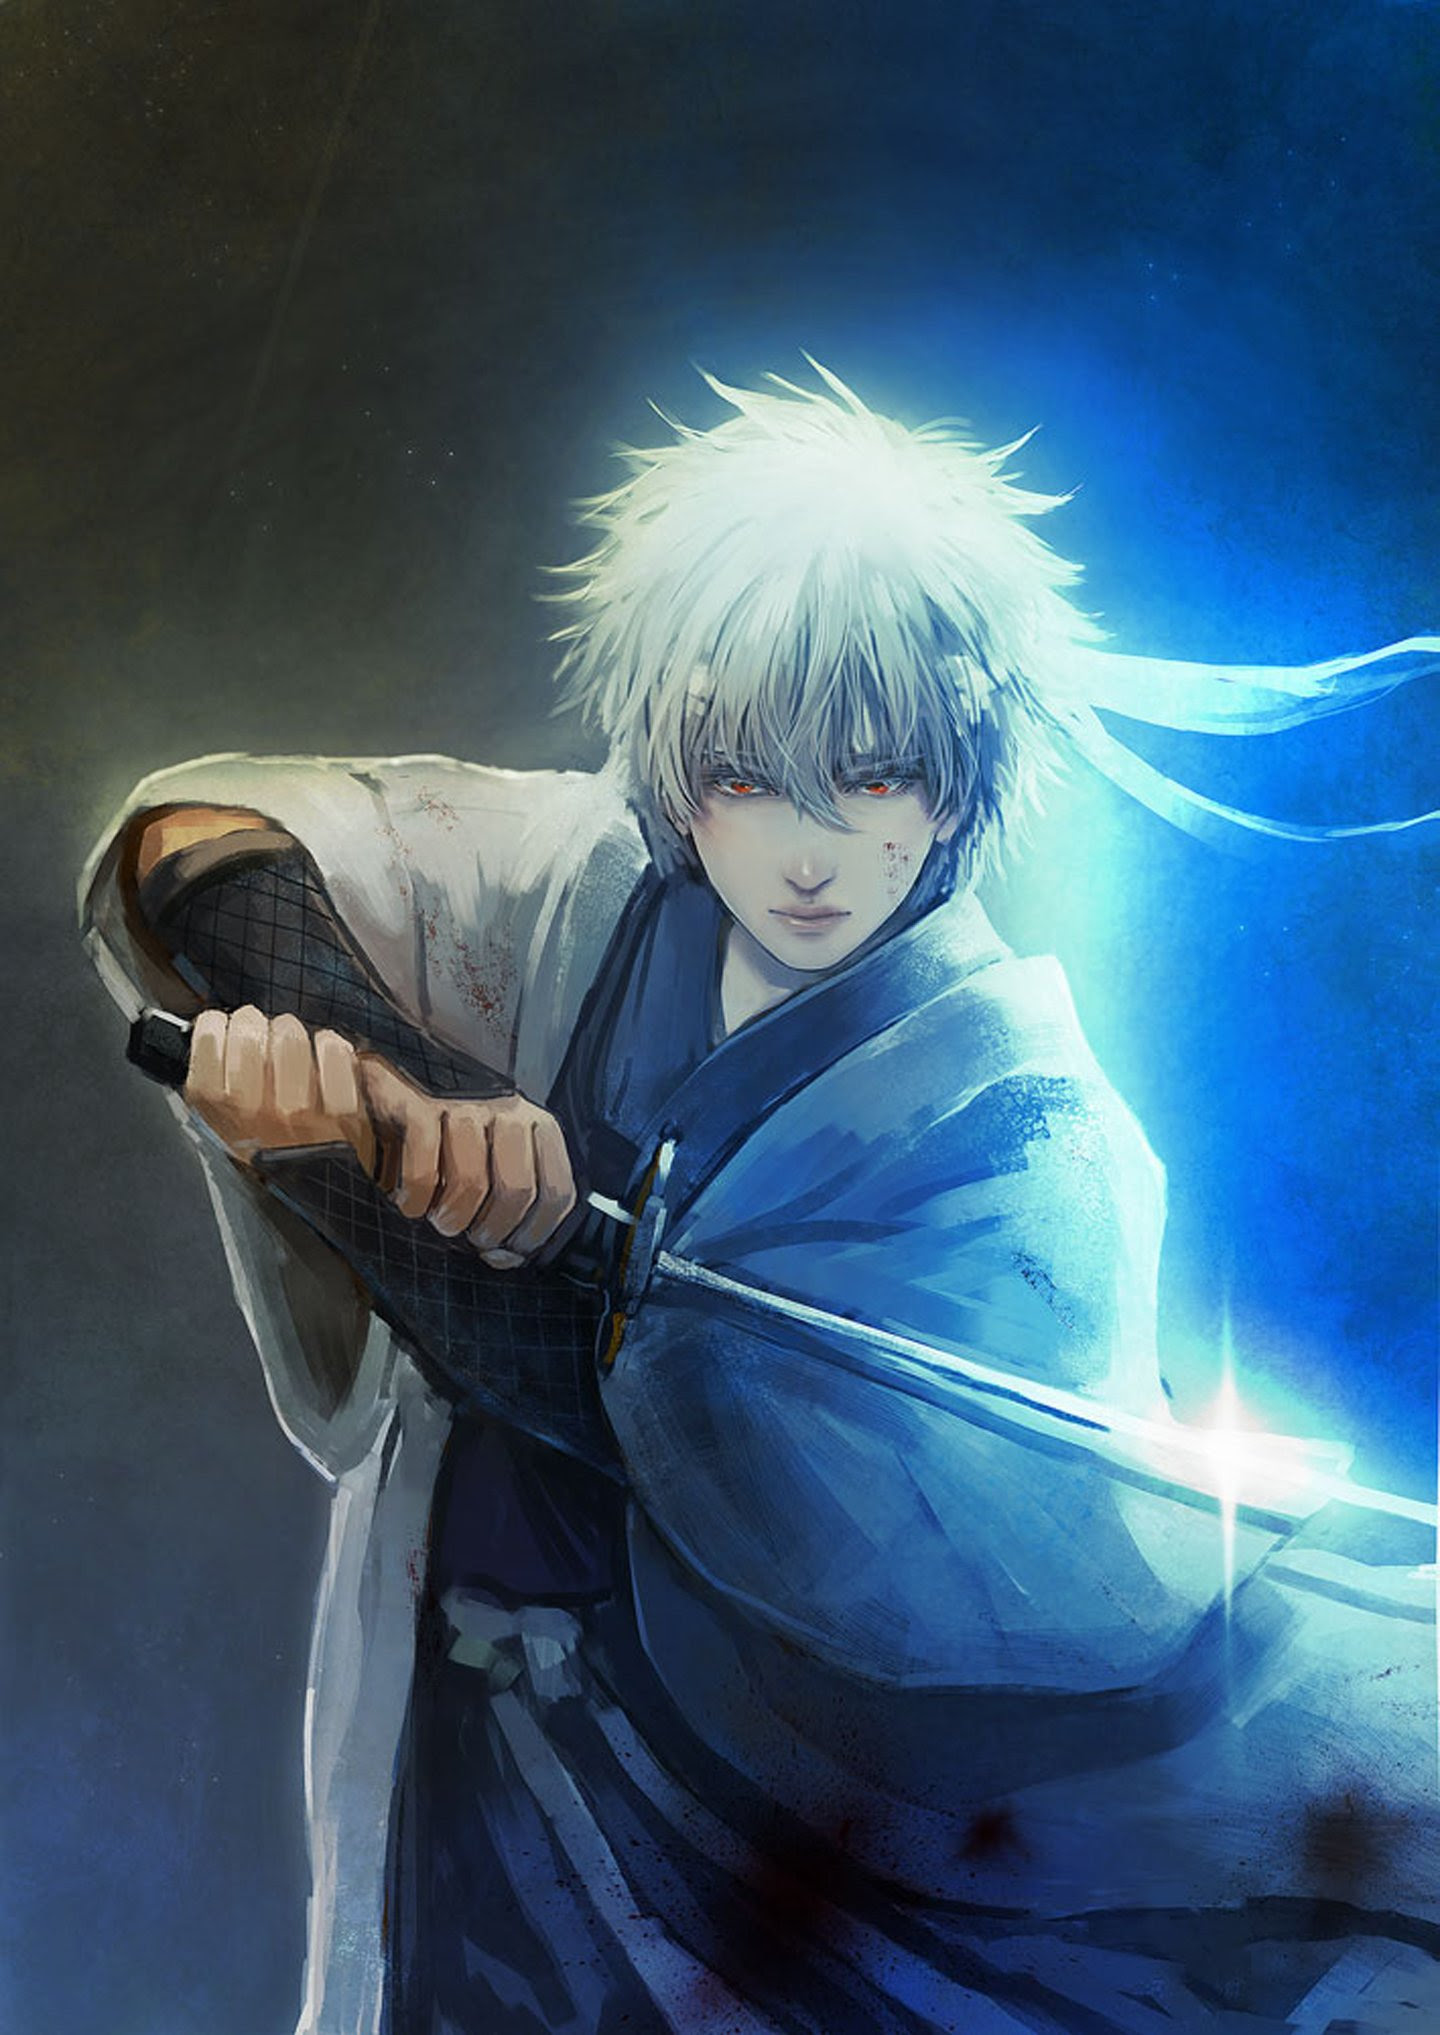 Anime series gintama character sword male guy light wallpaper  1440x2035  634347  WallpaperUP